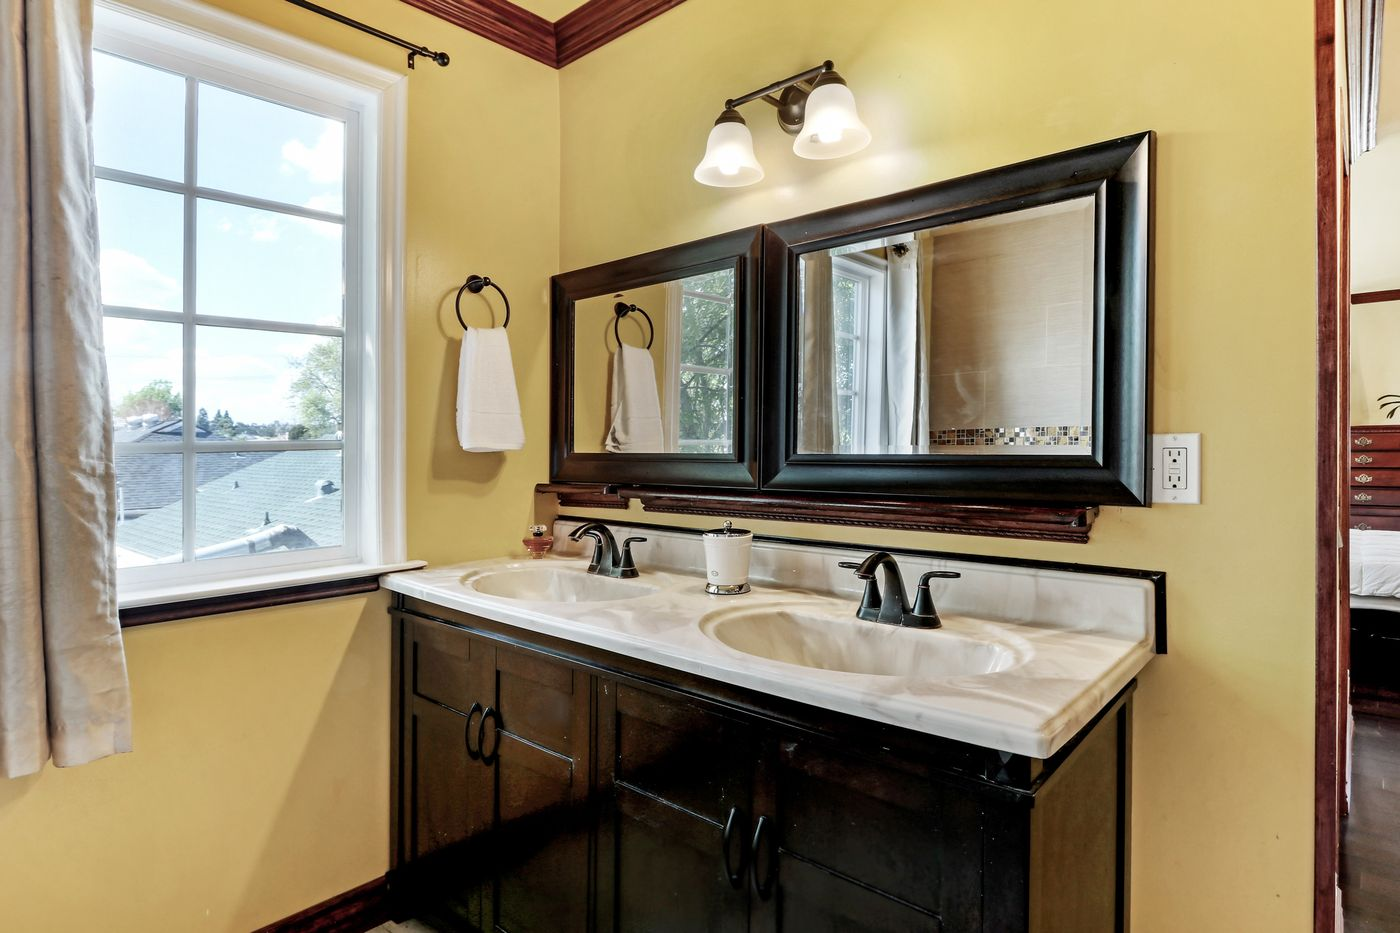 real-estate-photography-los-angeles-pasadena-glendale-burbank-AD-photographer-21